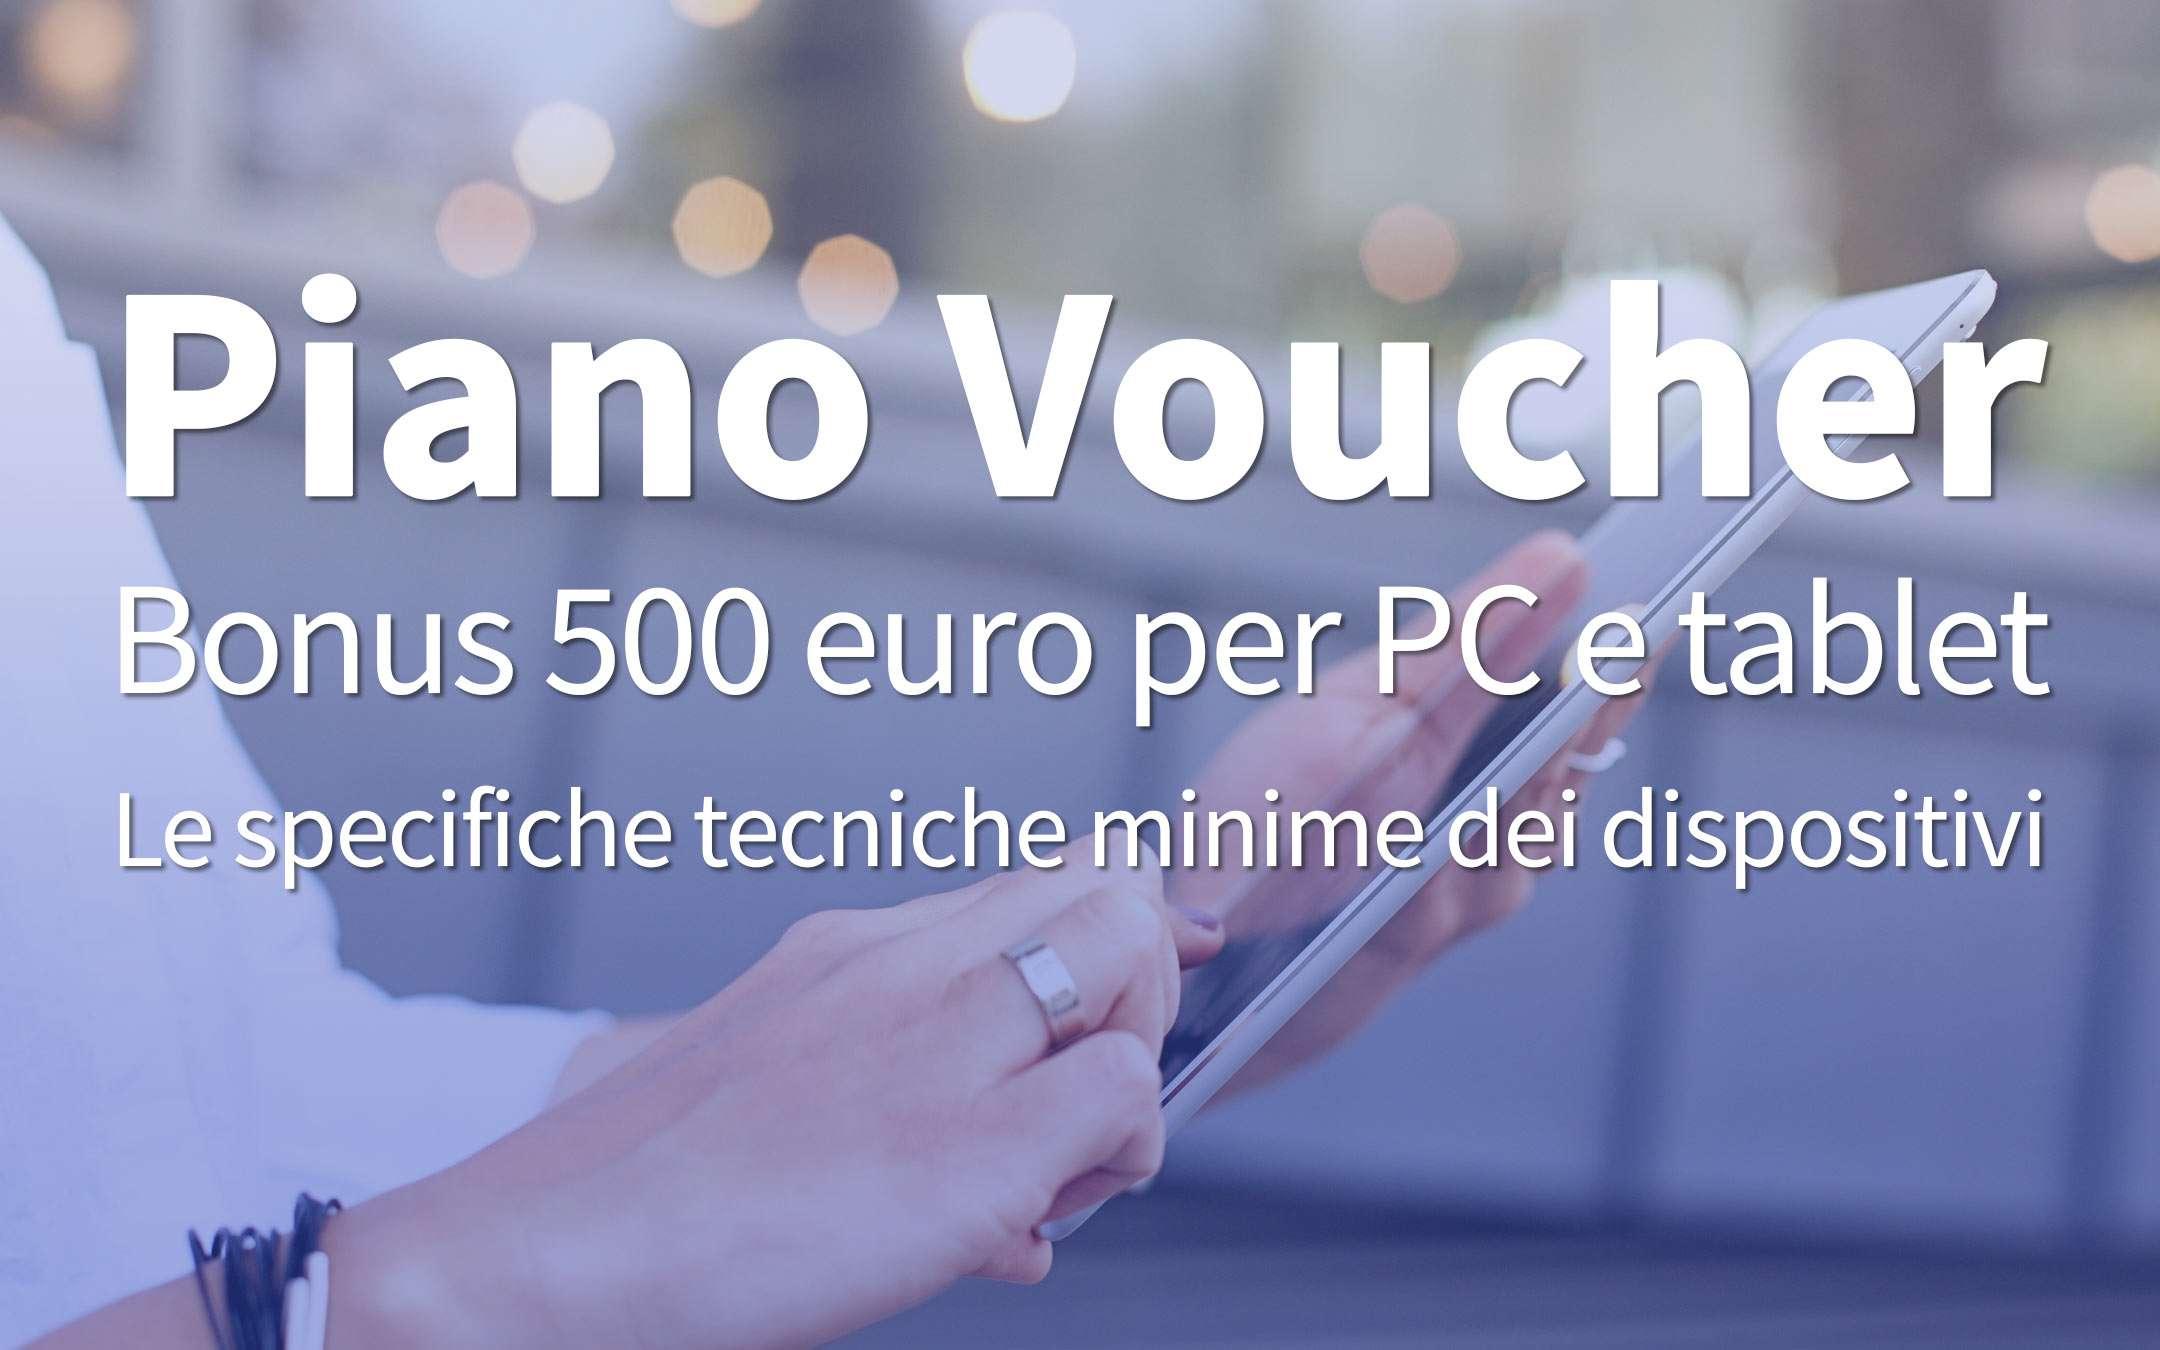 Bonus 500 euros PC and tablet: the minimum specifications